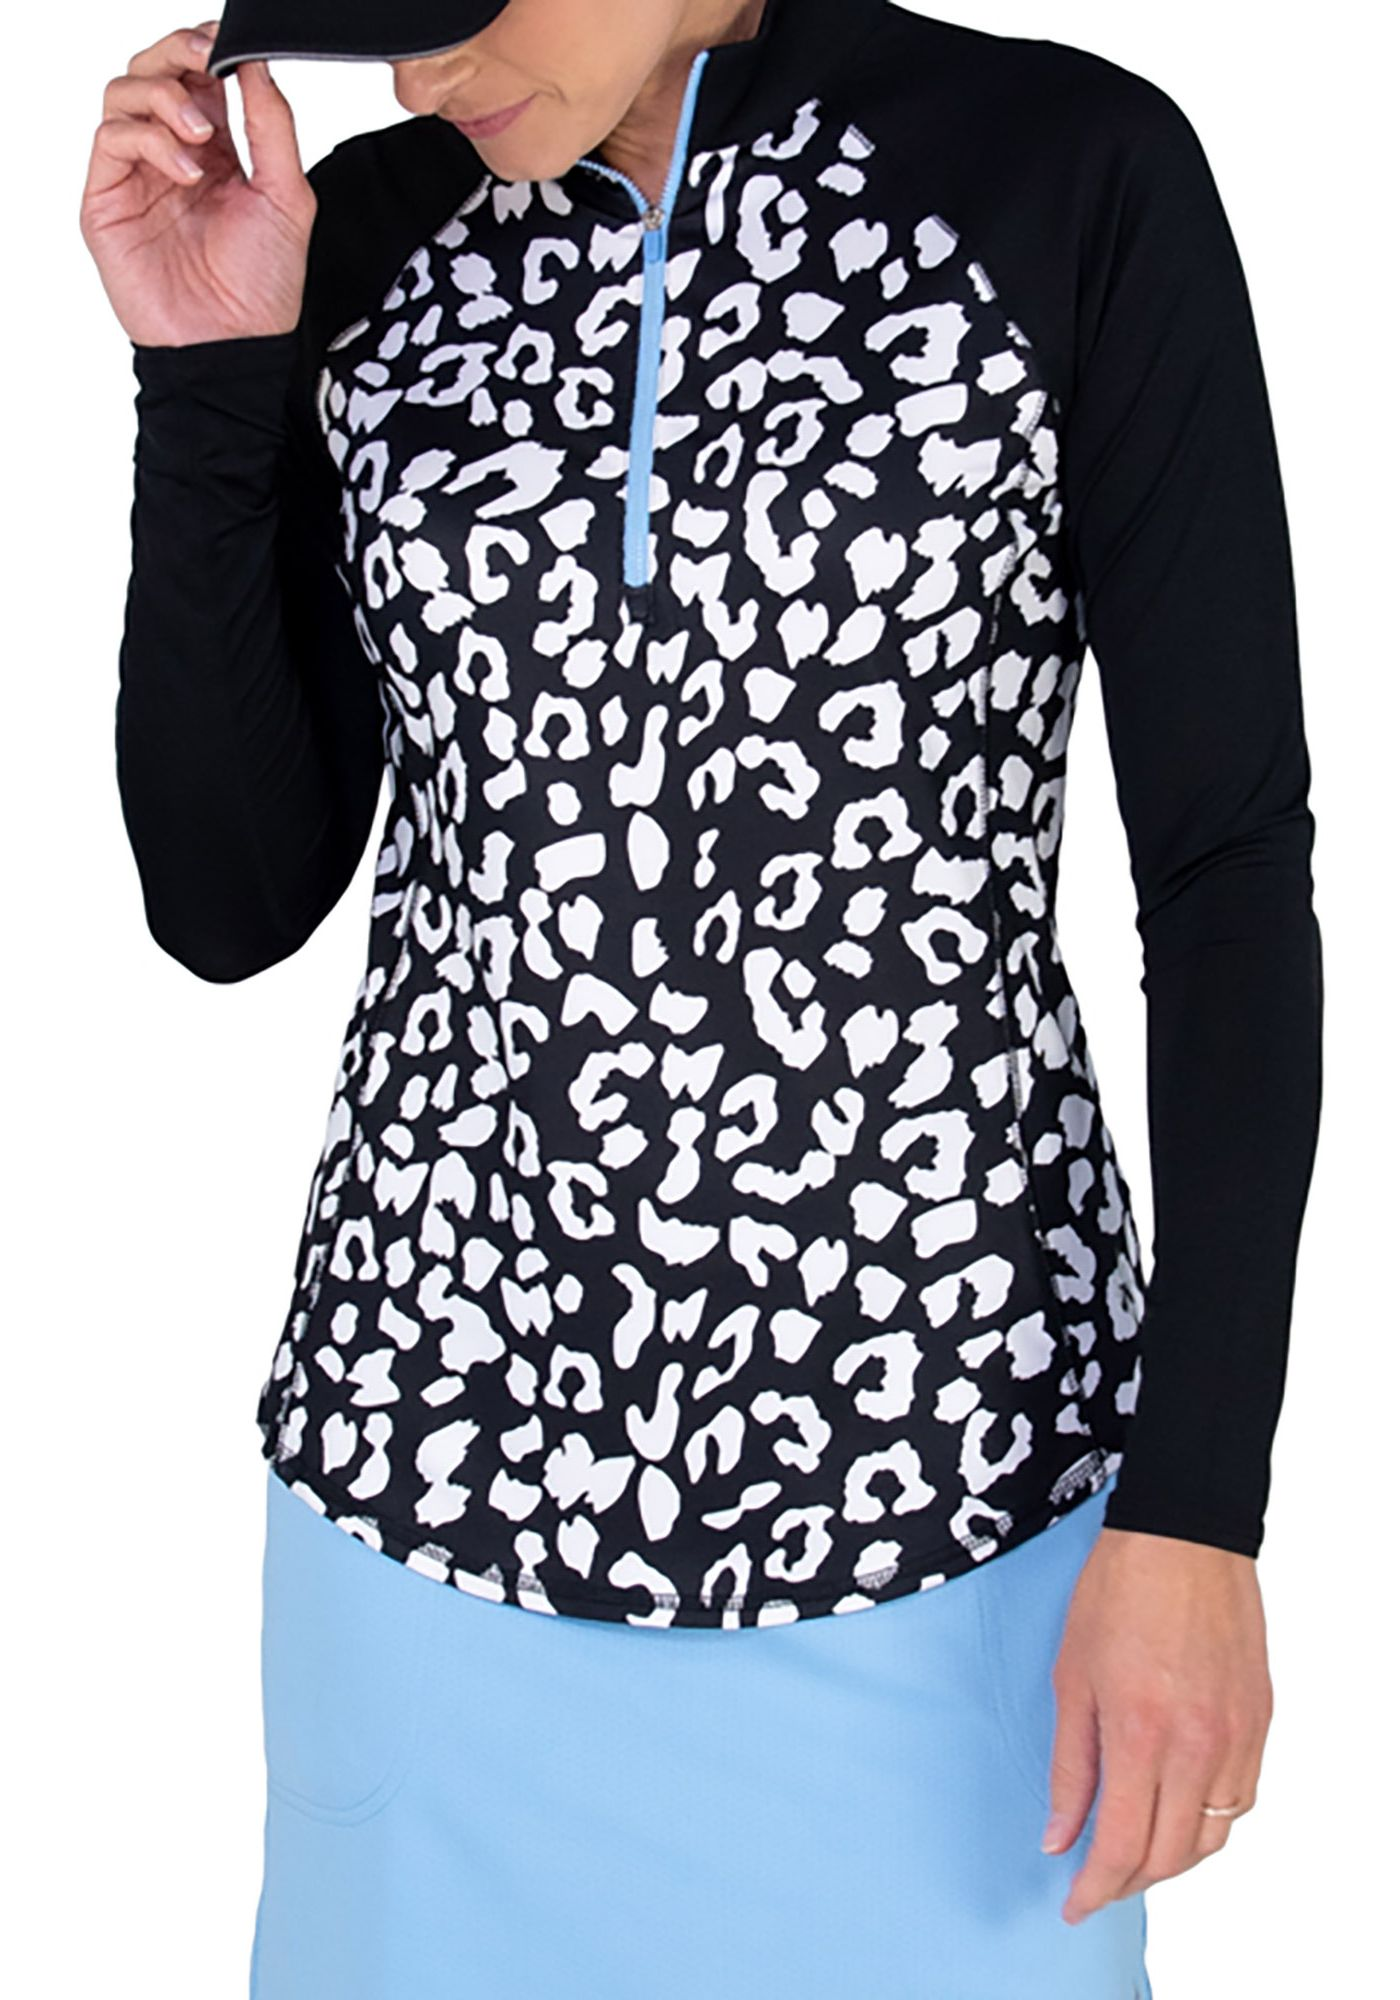 Jofit Women's Printed Rib Mock ¼ Zip Golf Pullover